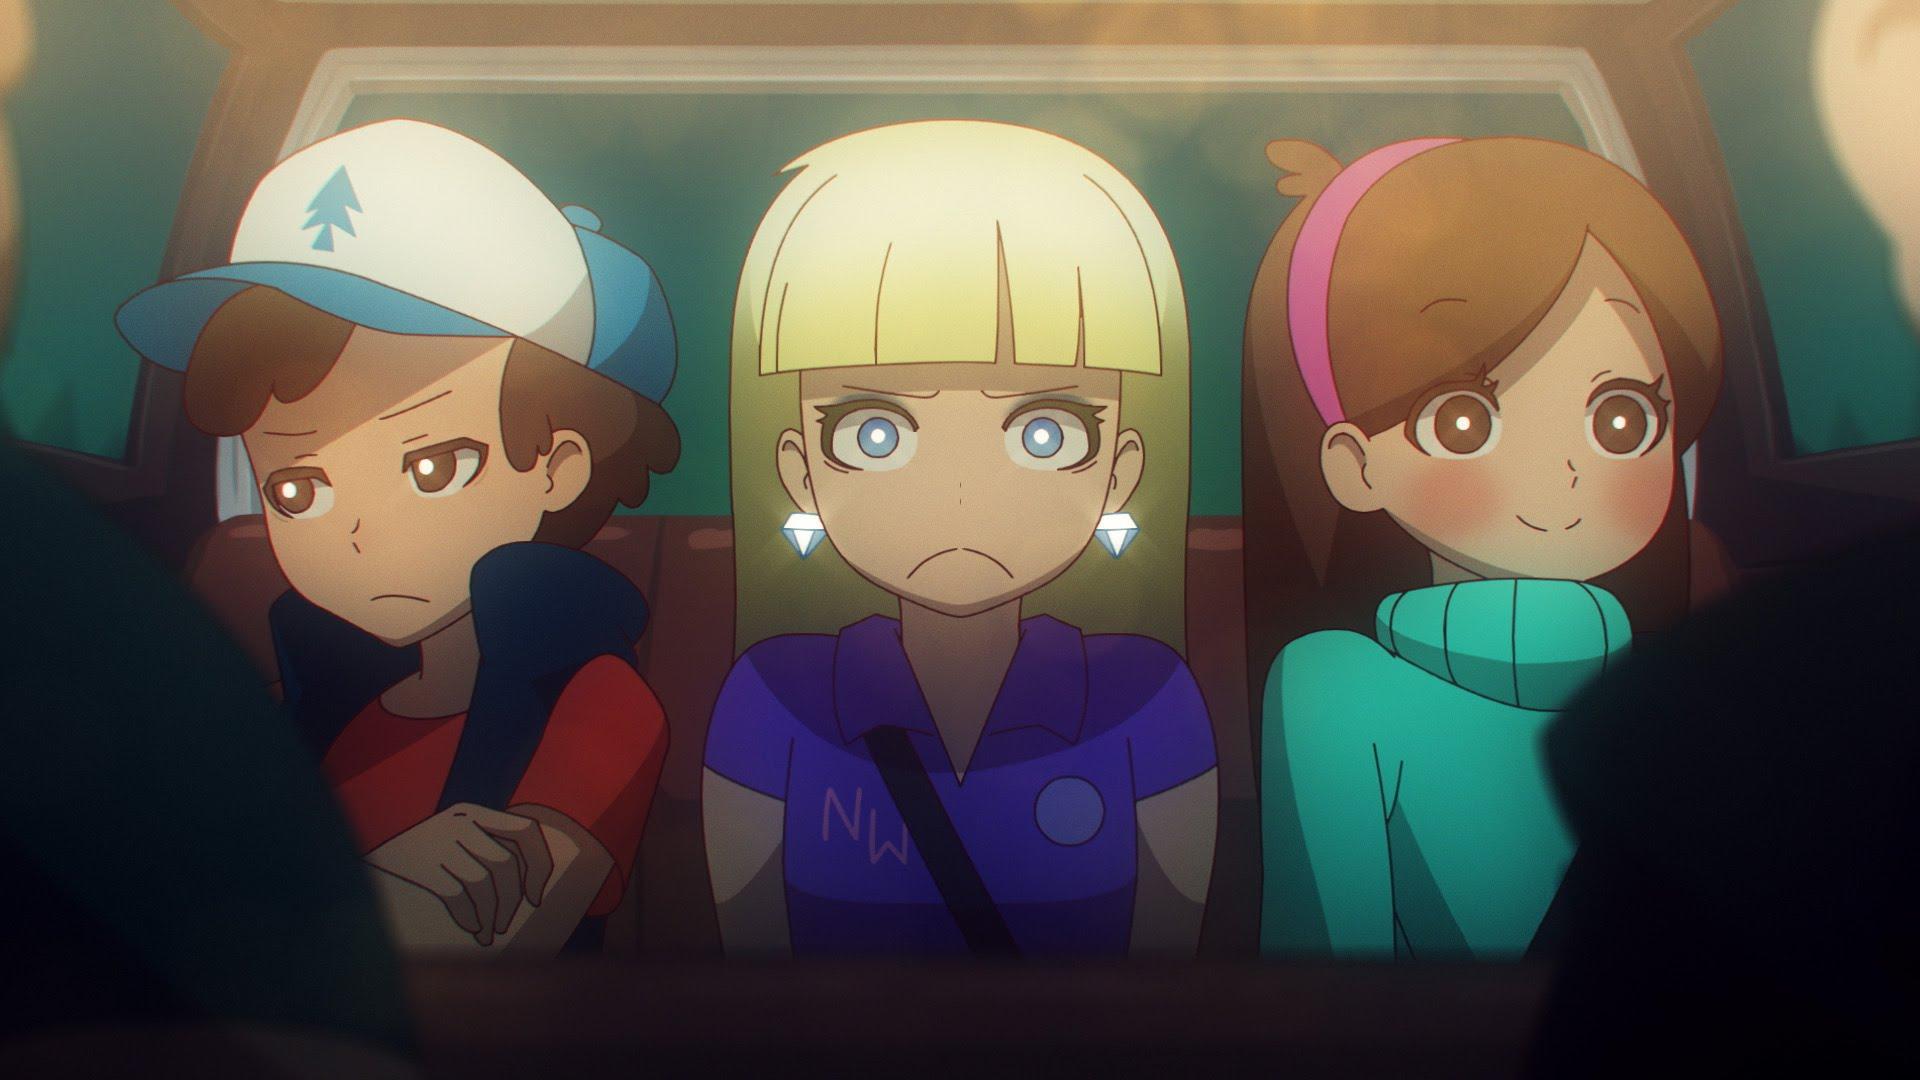 maxresdefault9J41CK75 Gravity Falls als Anime